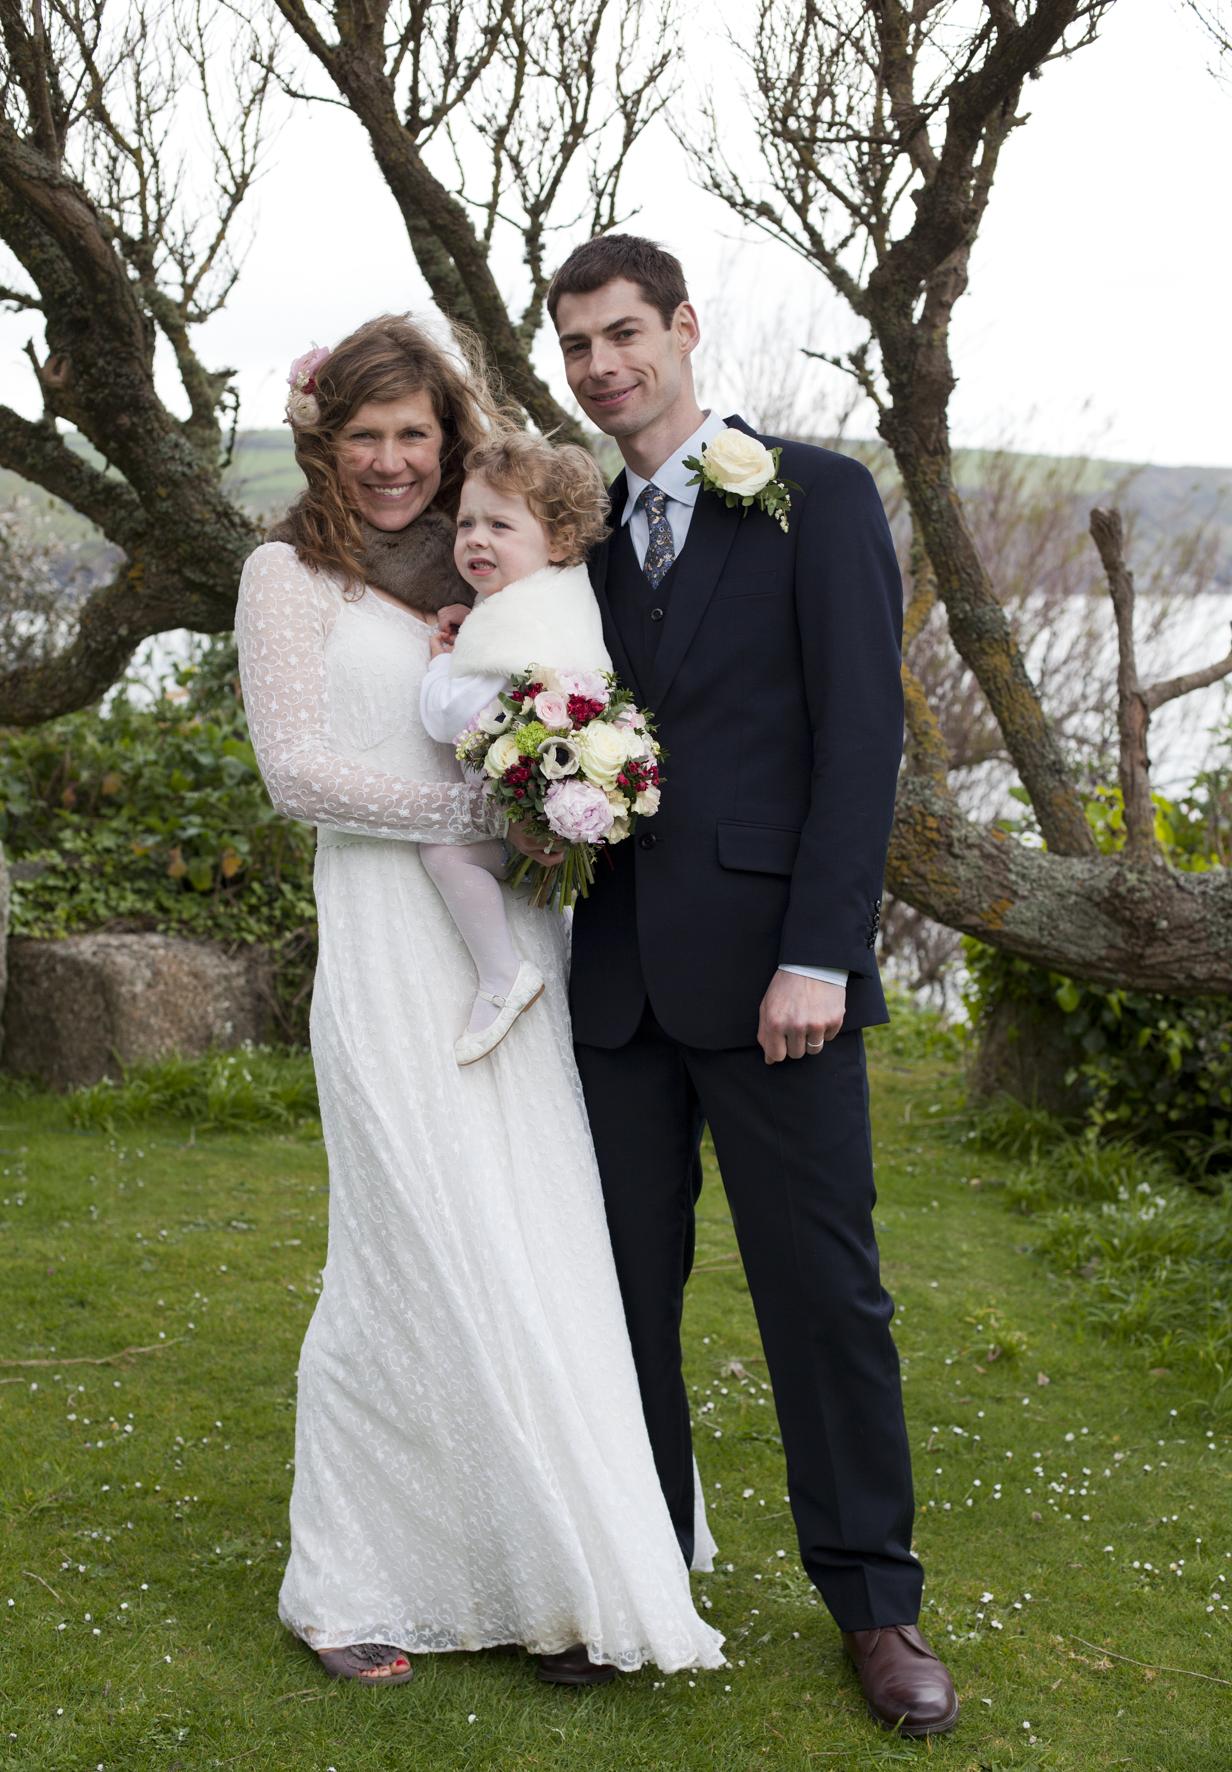 Wedding example_M&P__MG_4036-Edit_Claudia Leisinger.jpg